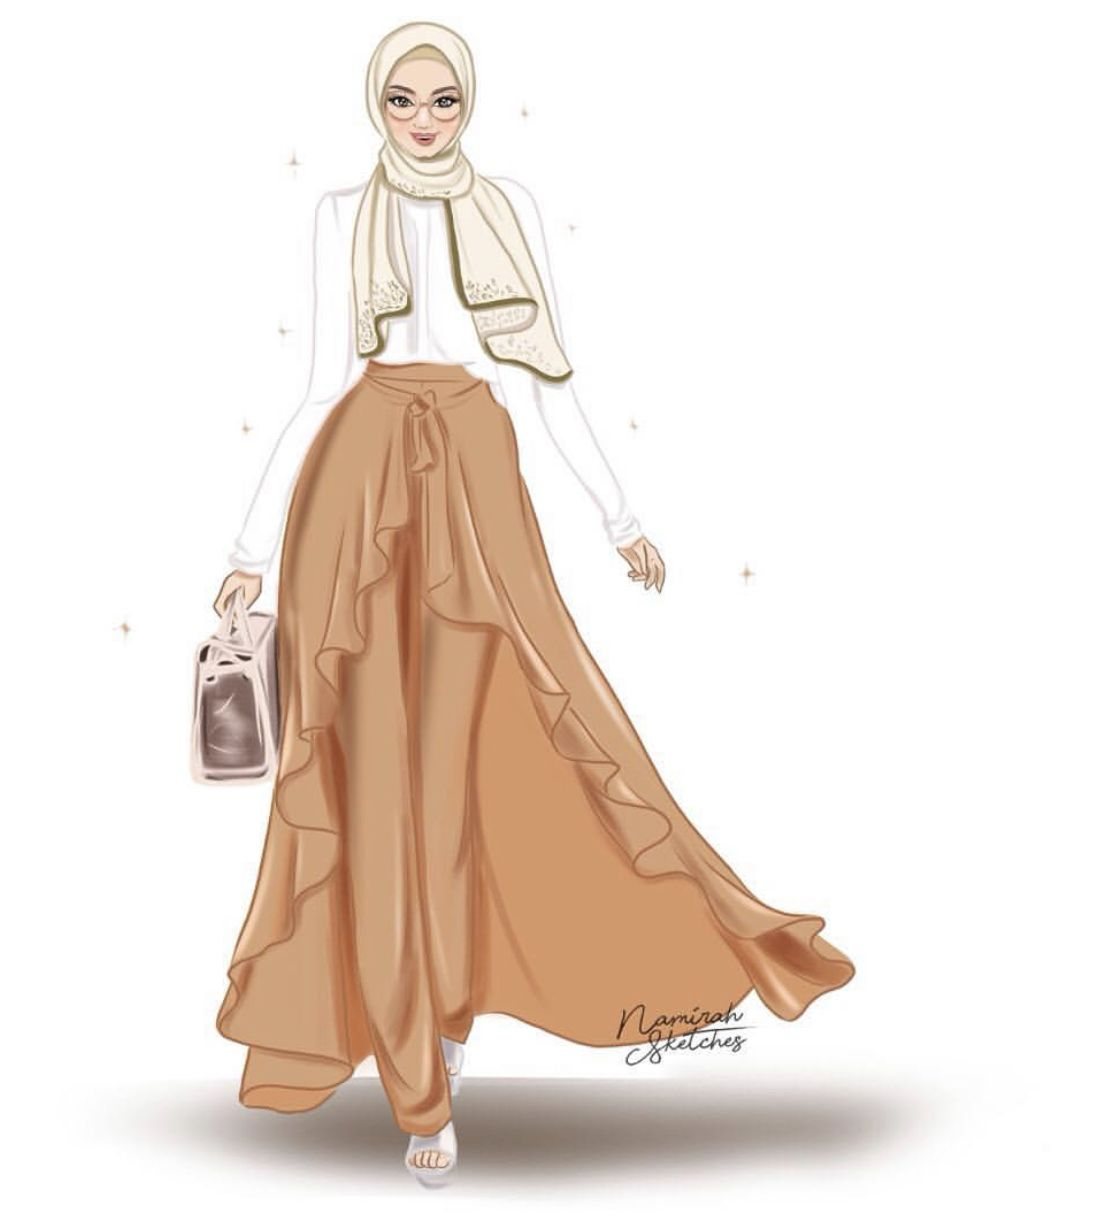 millennials  Gaya model pakaian, Sketsa model pakaian, Desain busana